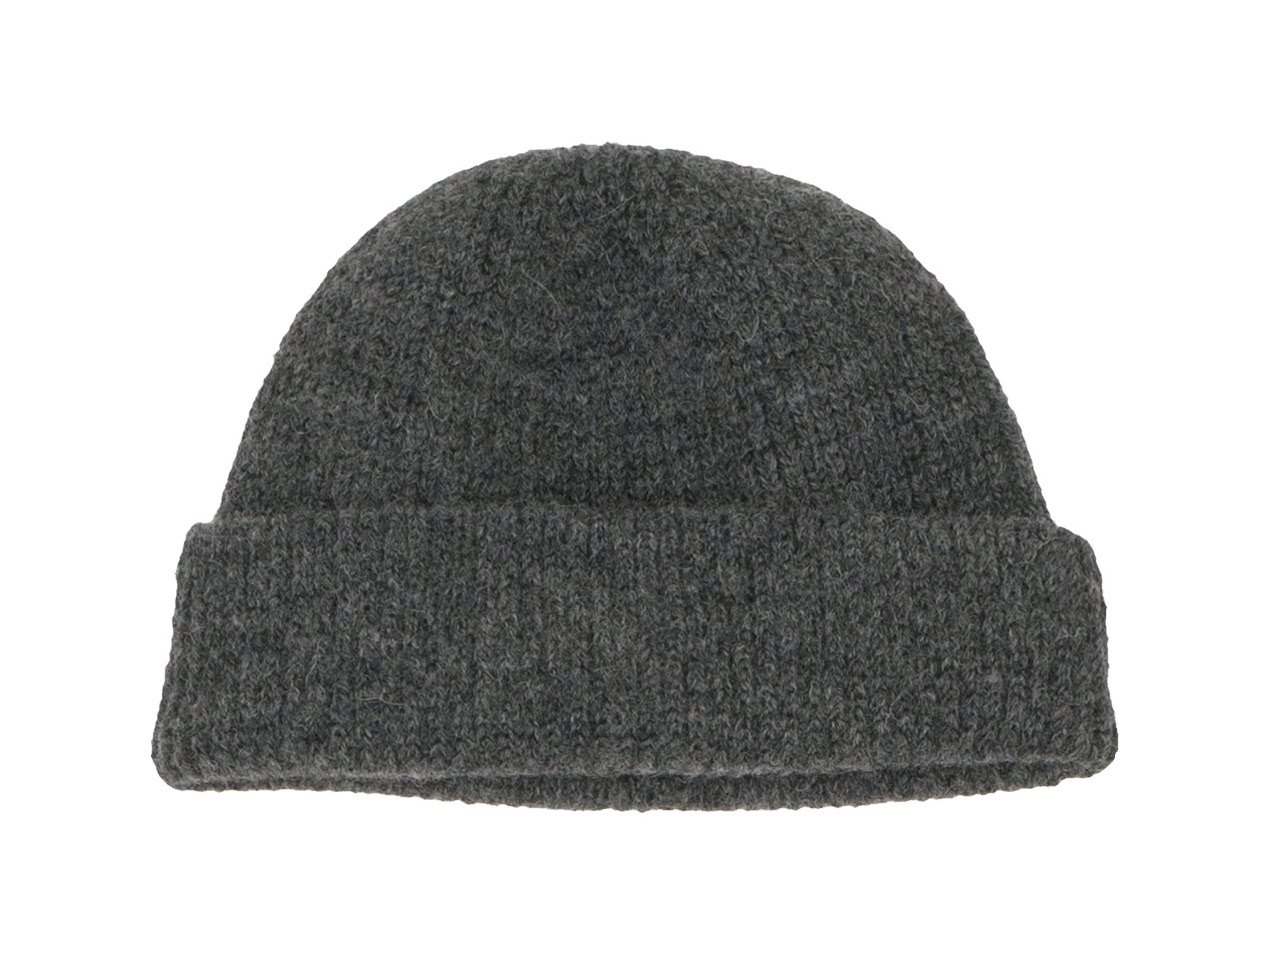 RINEN 2/21ウールアゼ編み ニット帽 03グレー